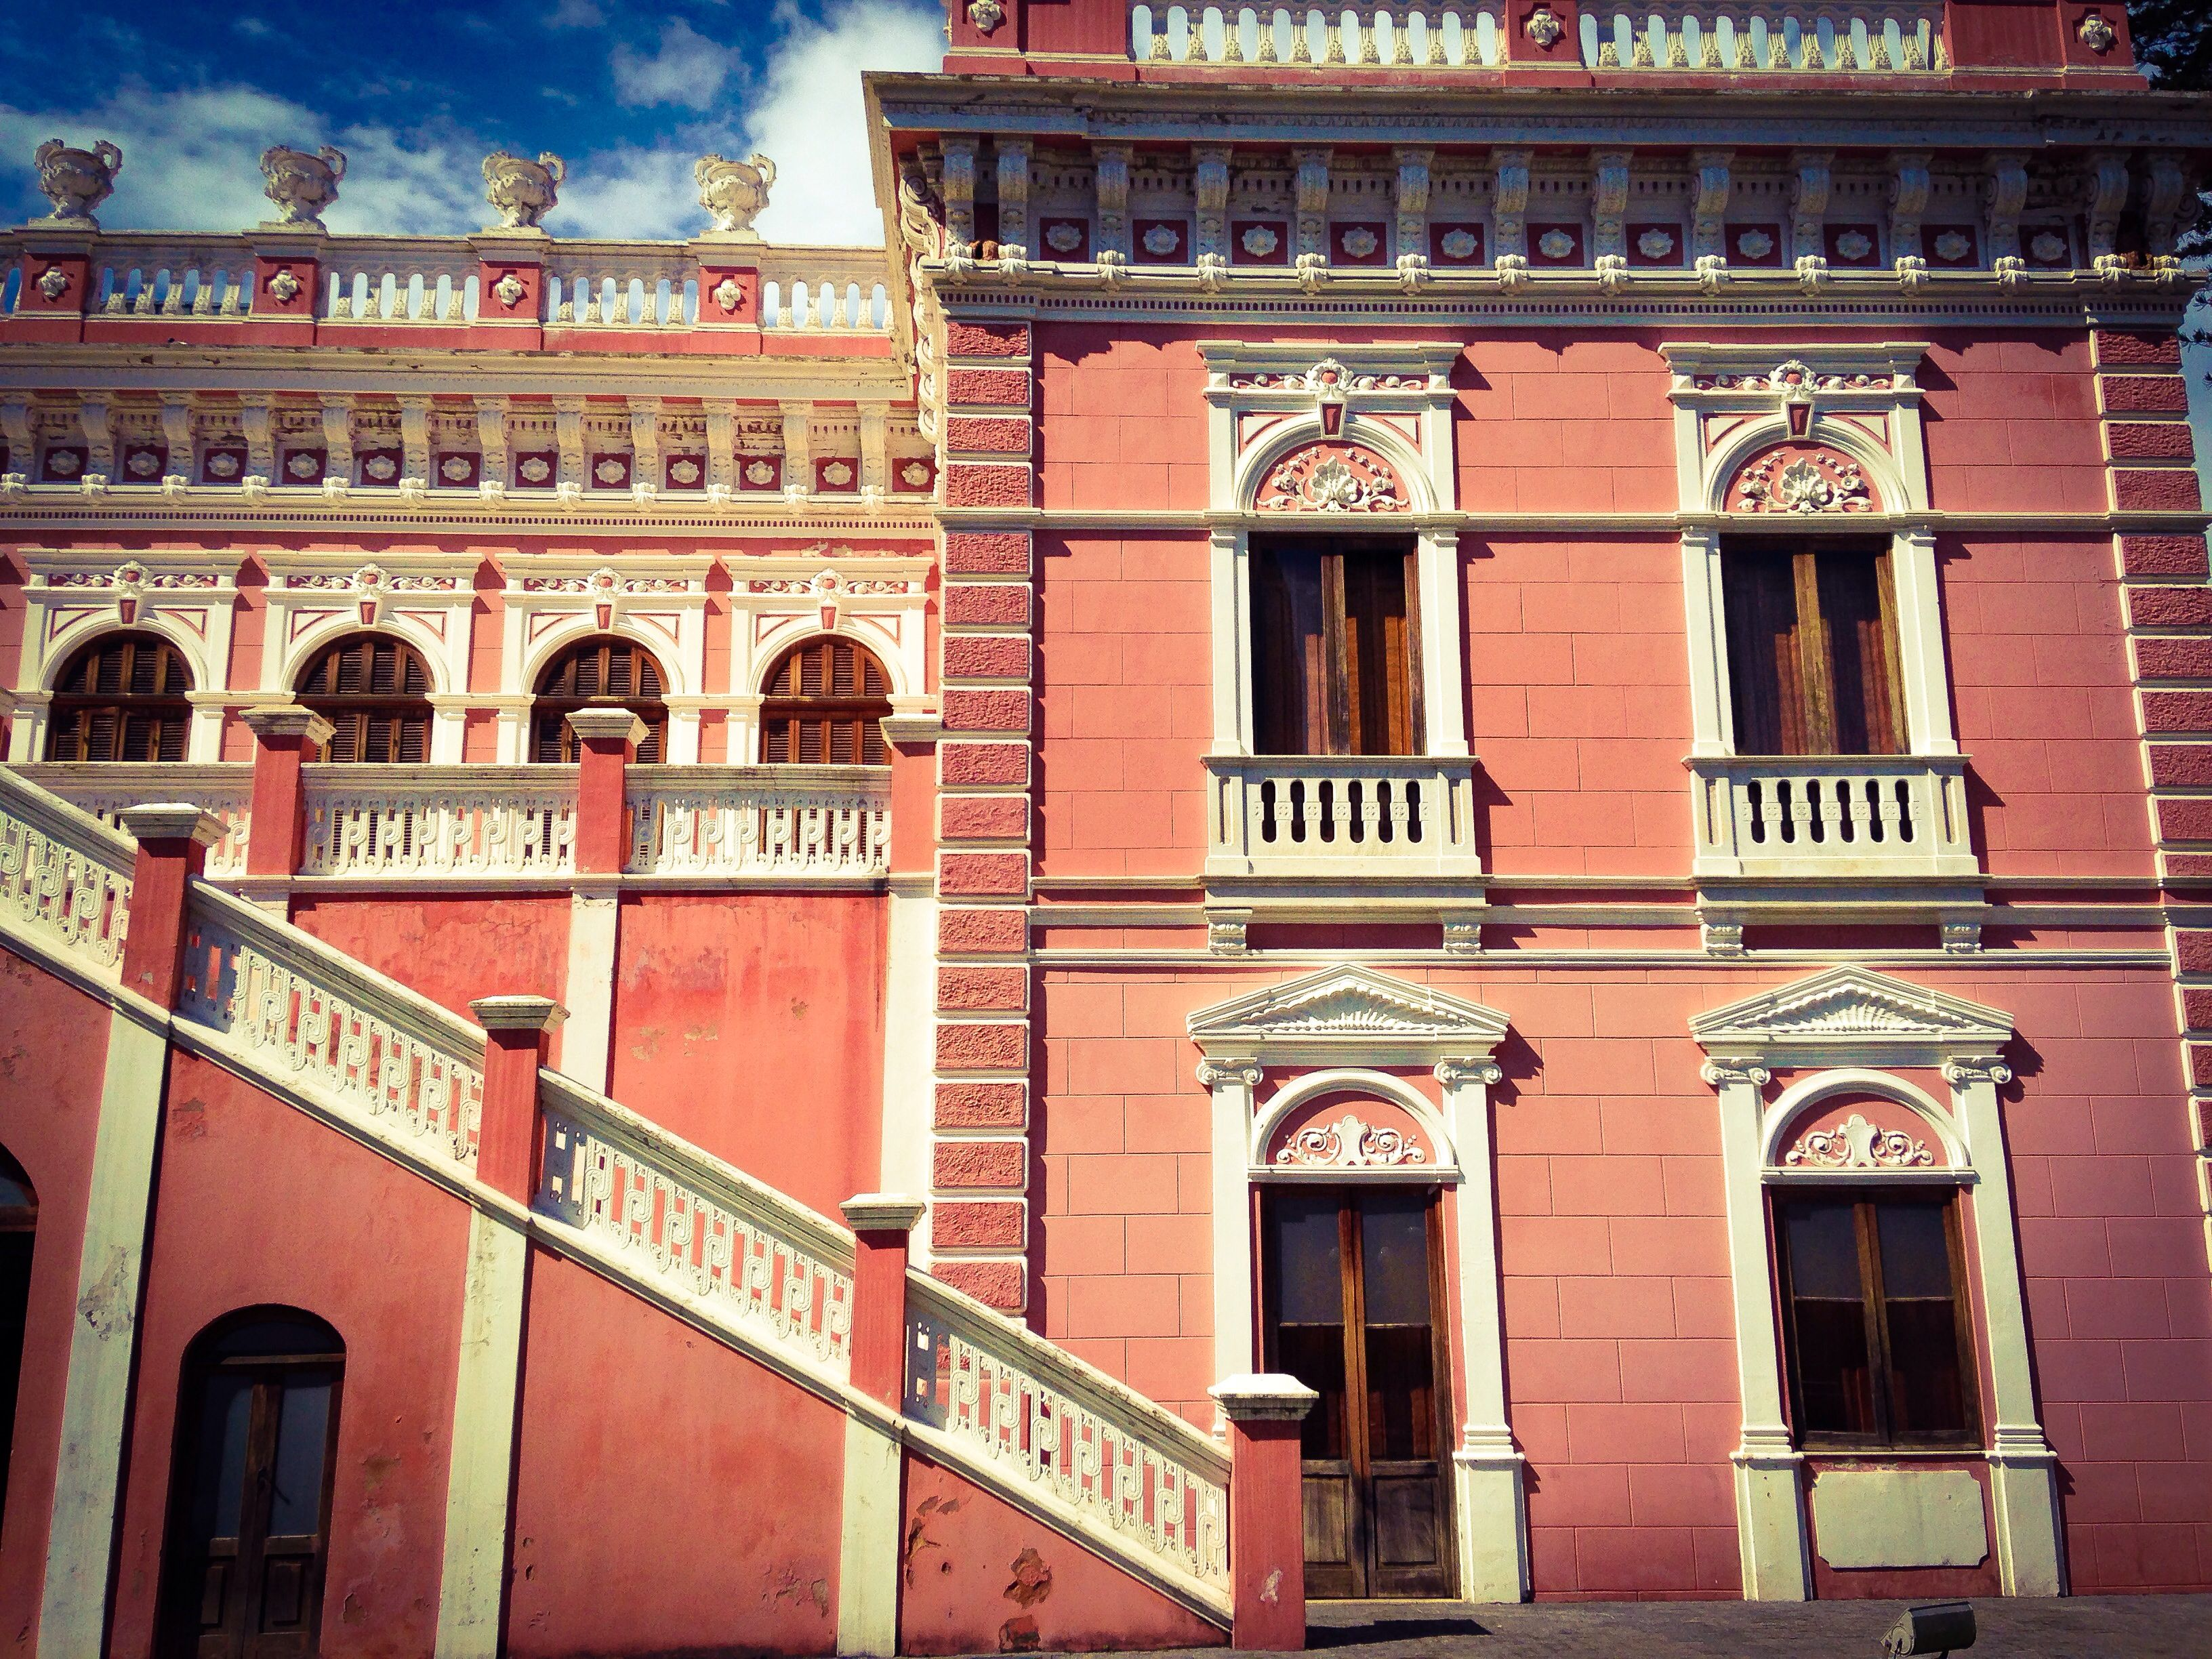 Palácio Cruz & Souza